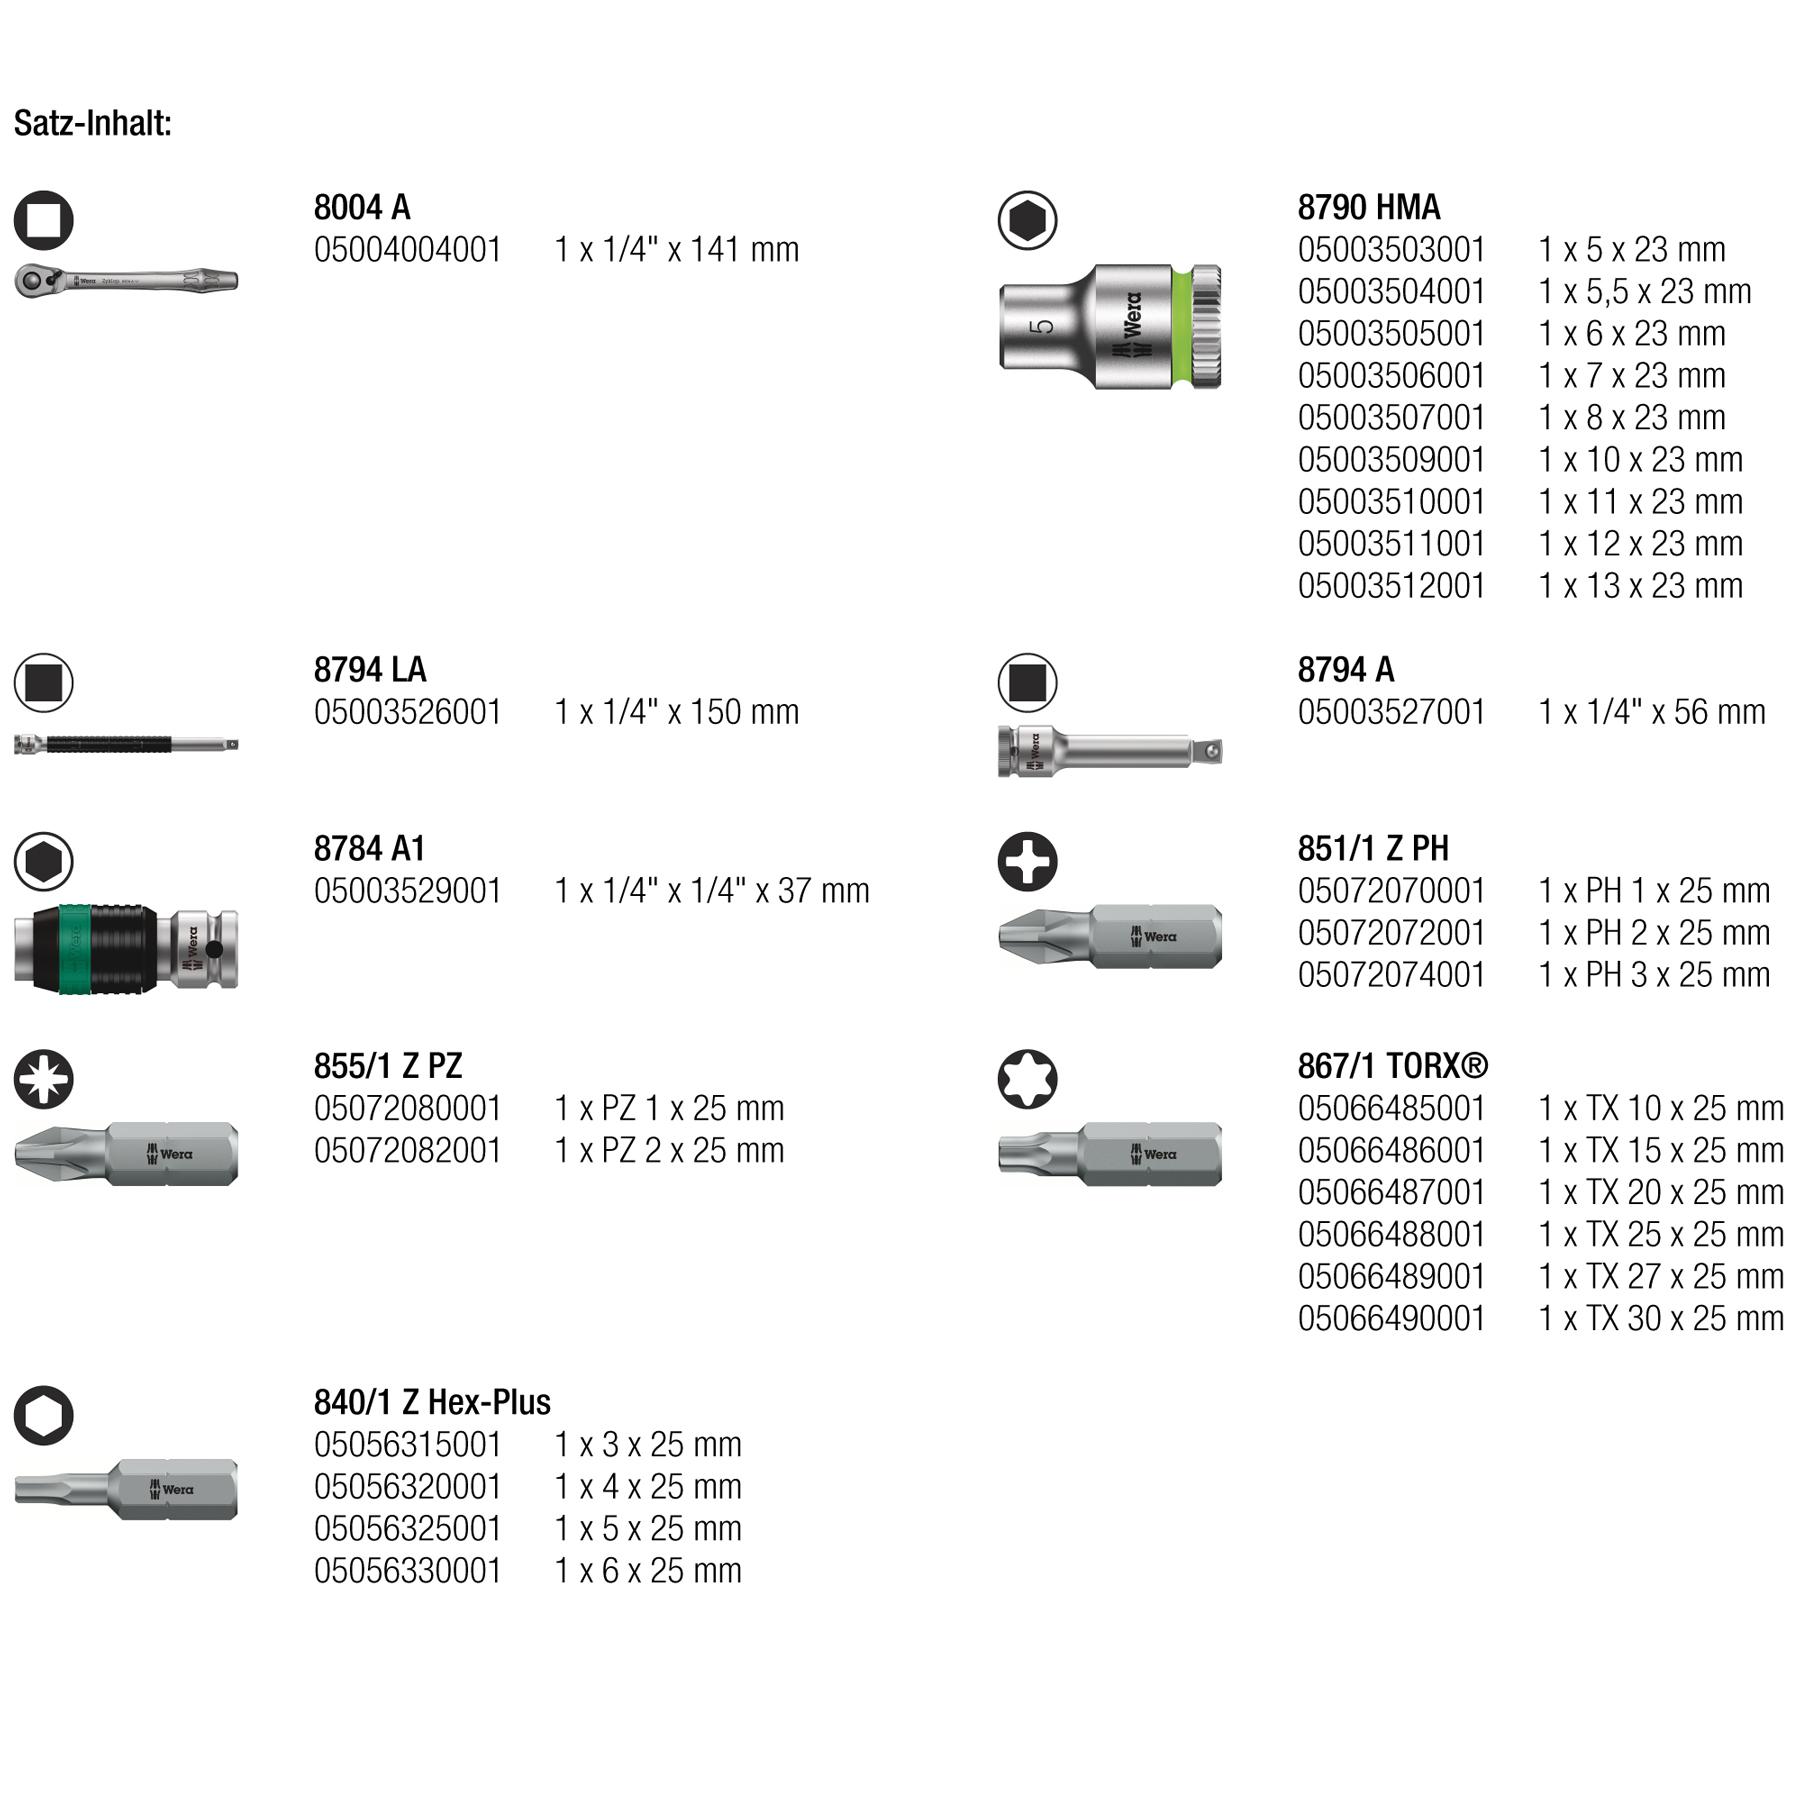 Image of Wera 8100 SA 8 Zyklop Metal Ratchet Set - 1/4 Inch